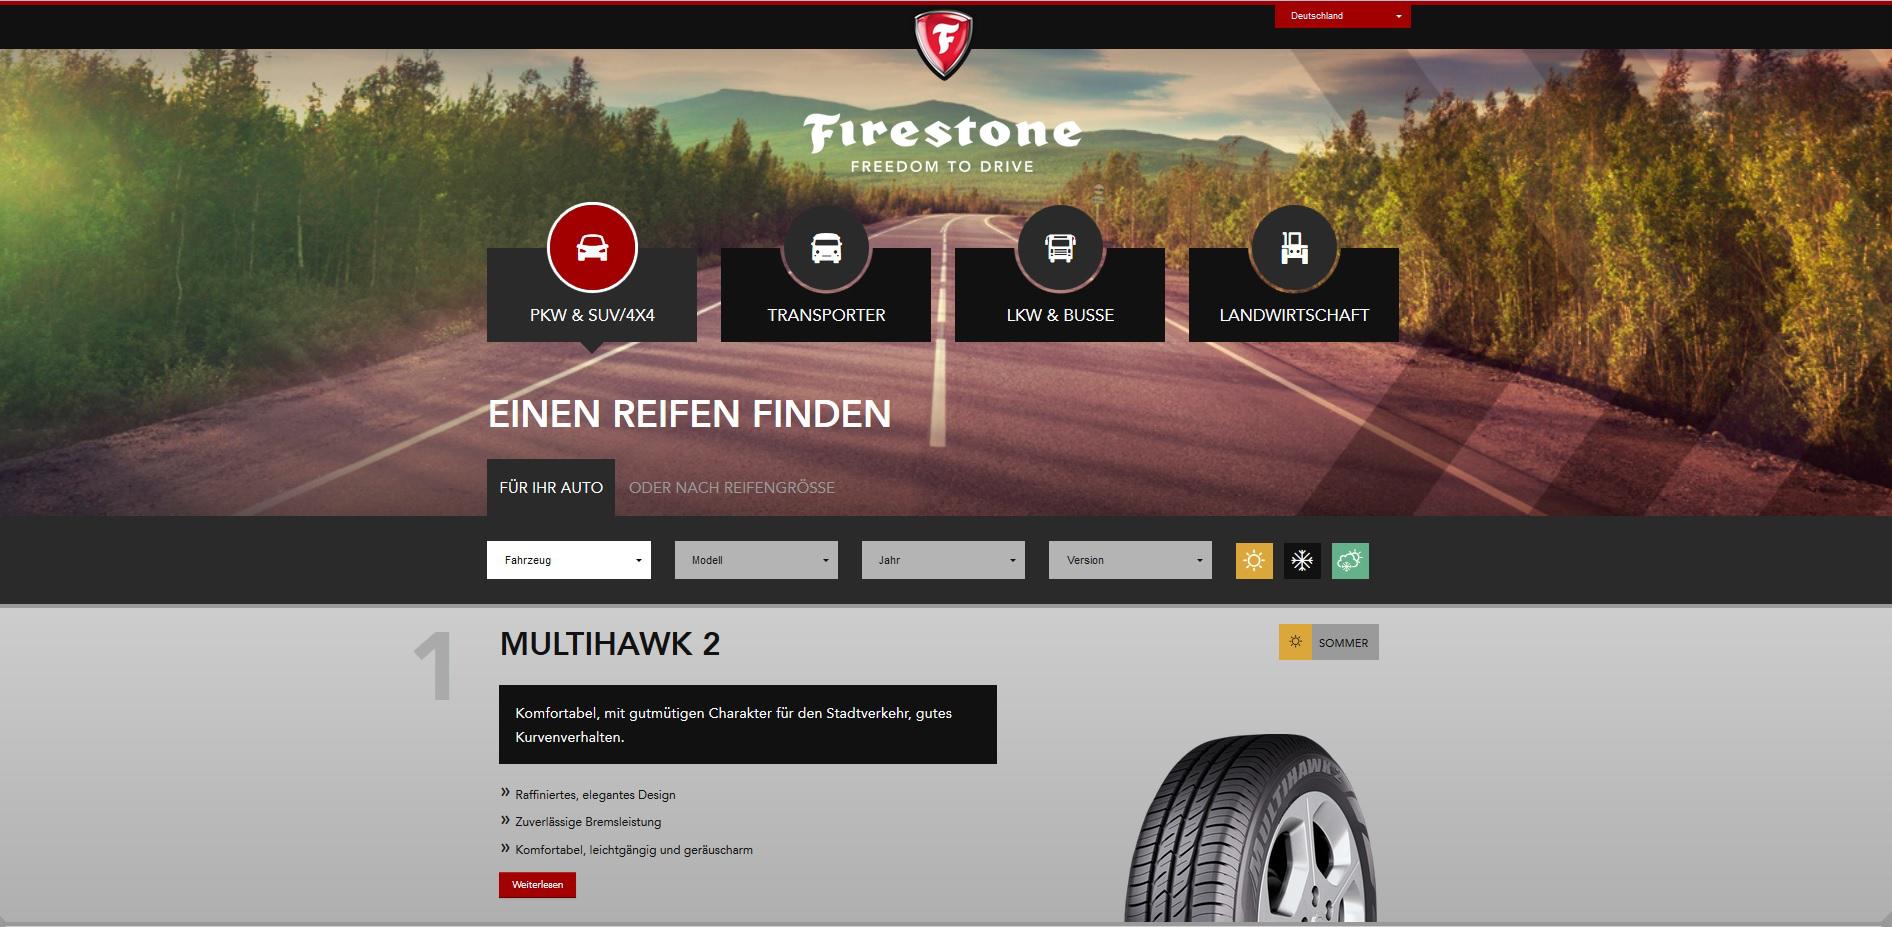 Firestone Website